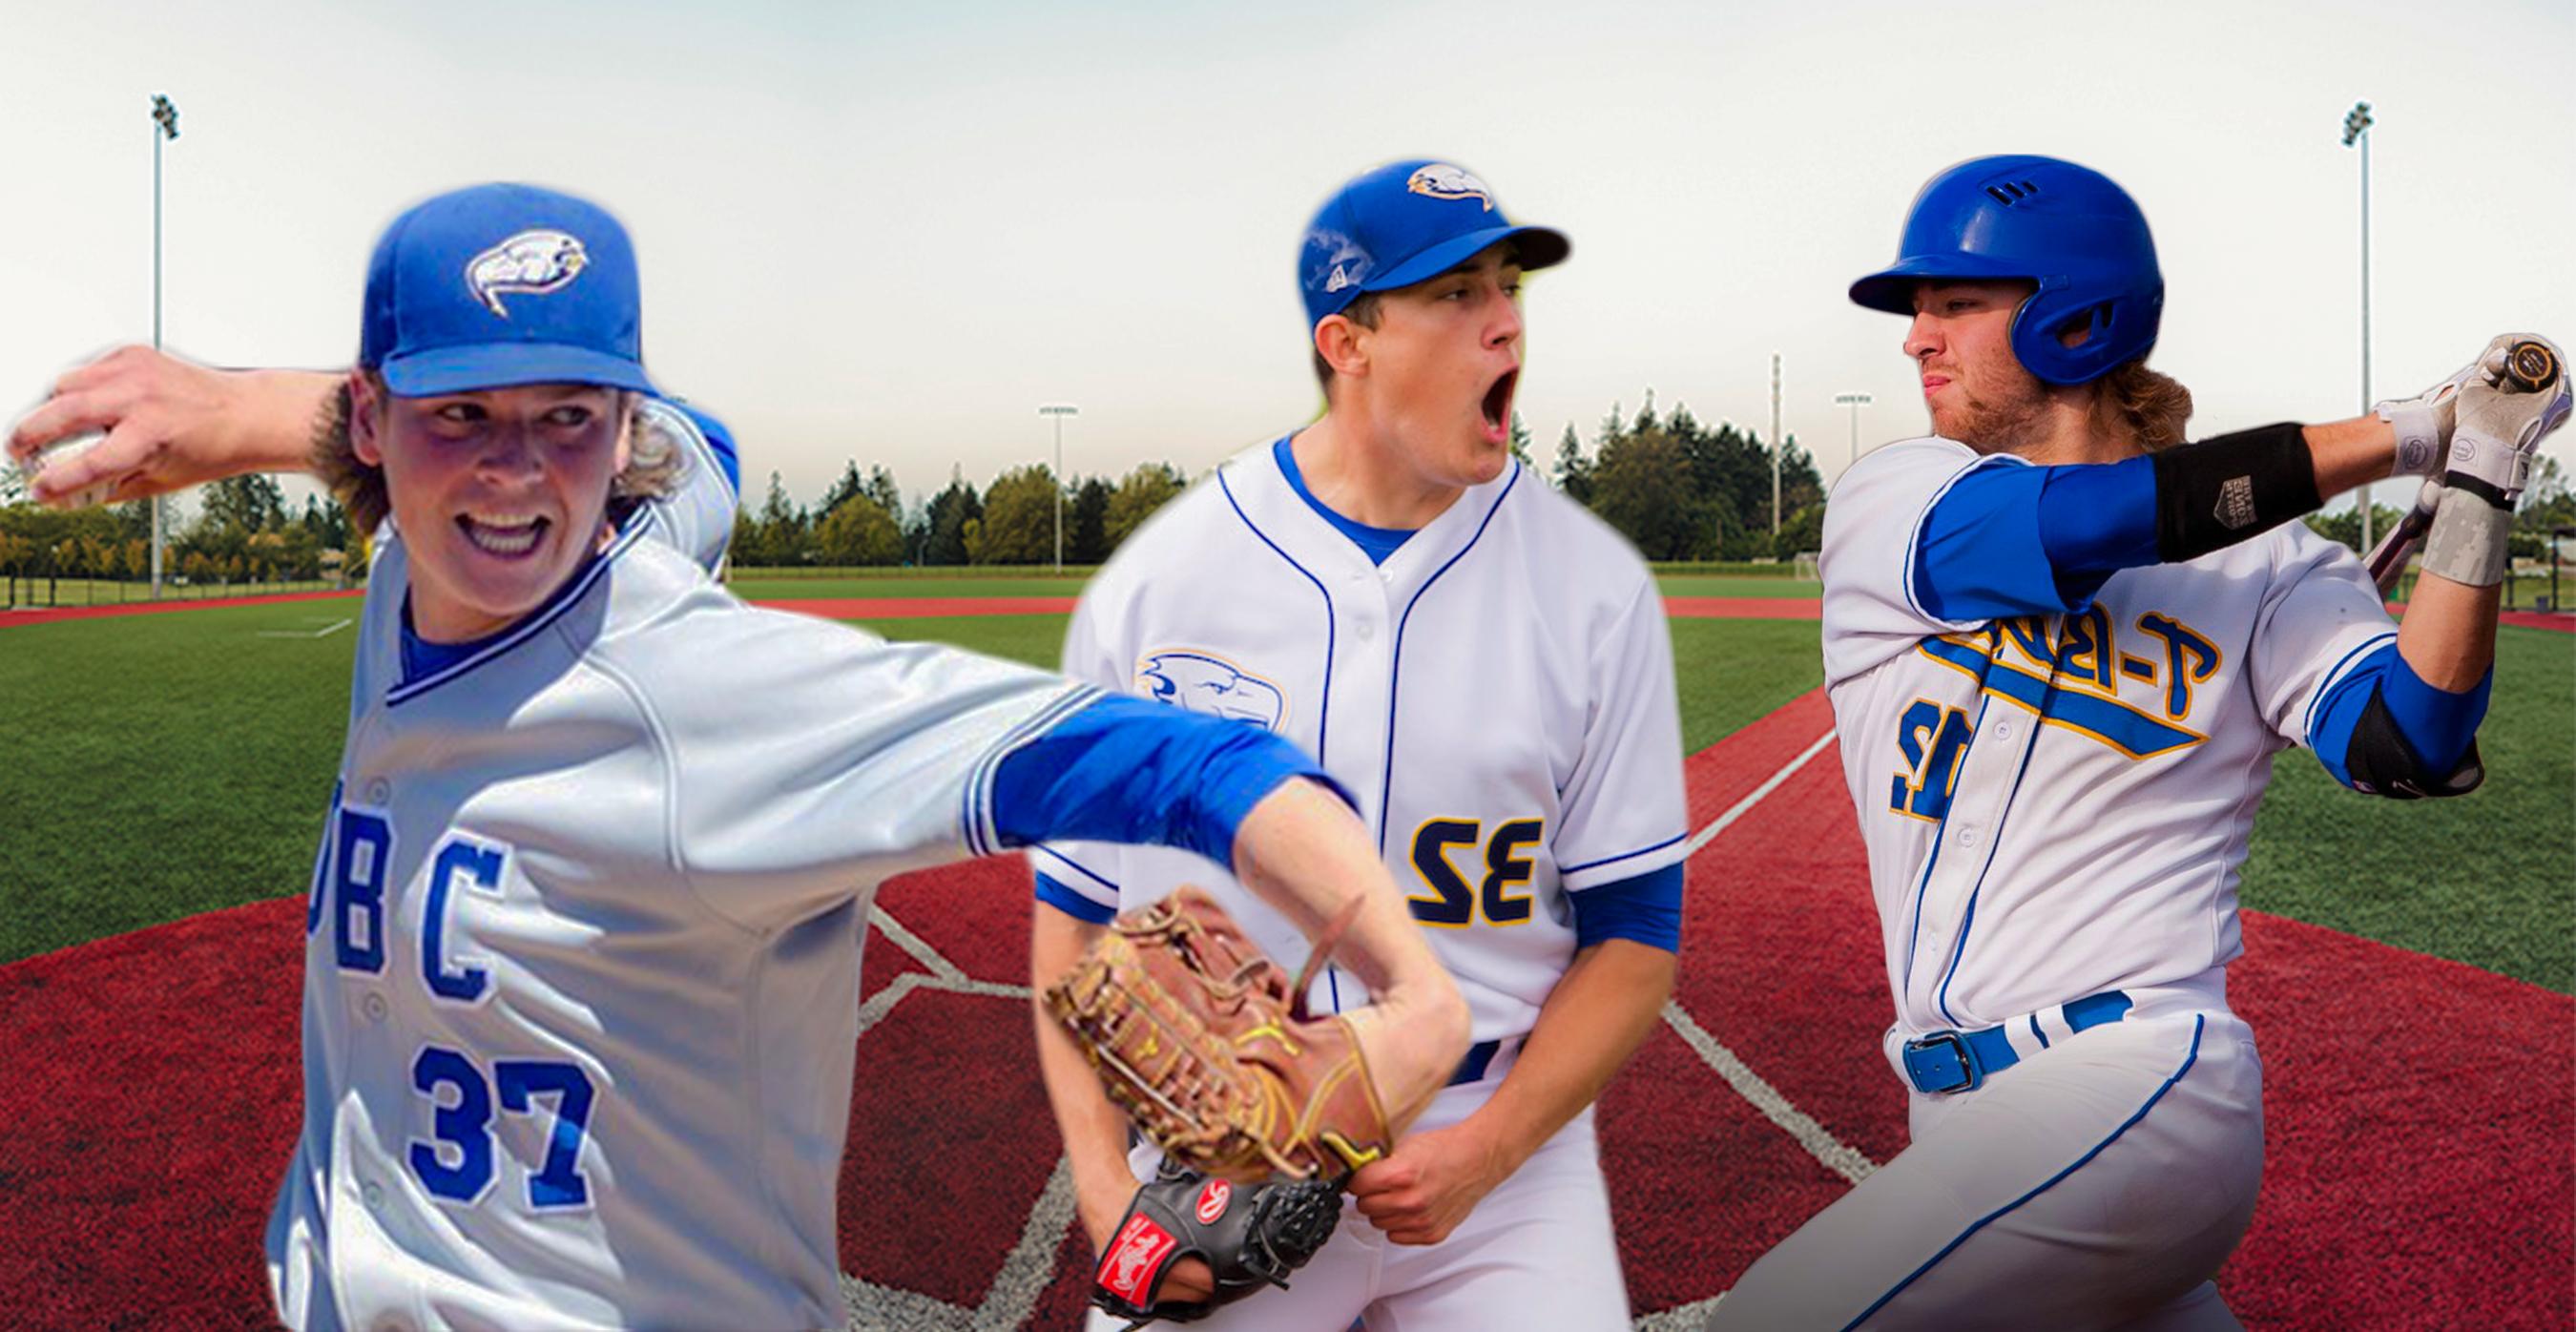 Three UBC baseball players were drafted into Major League Baseball.